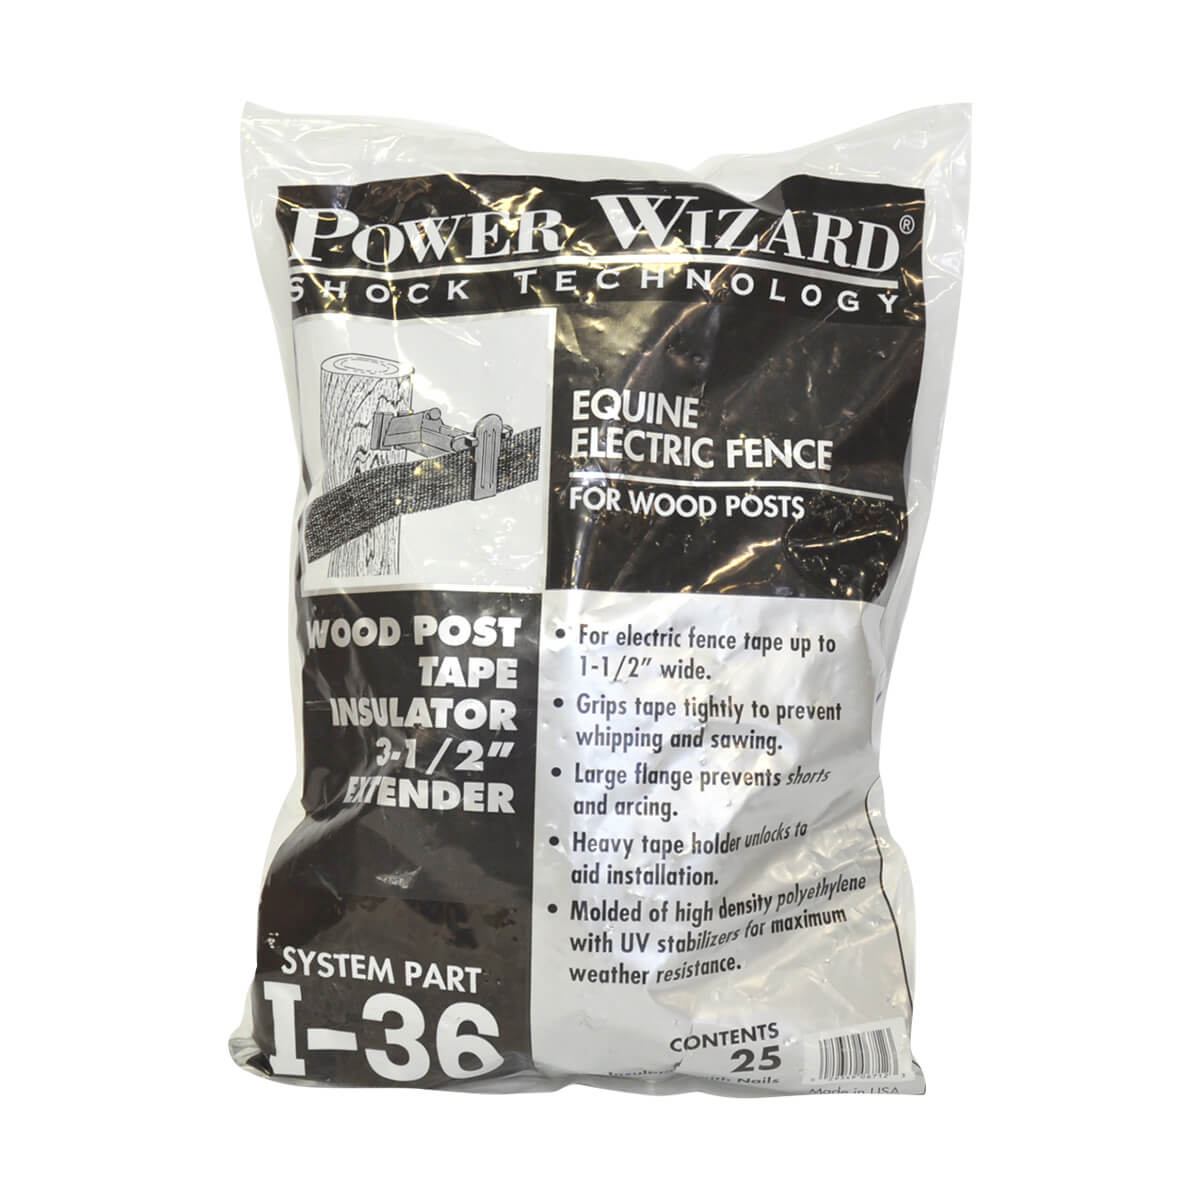 Power Wizard I-36 Wood Post Tape Insulator